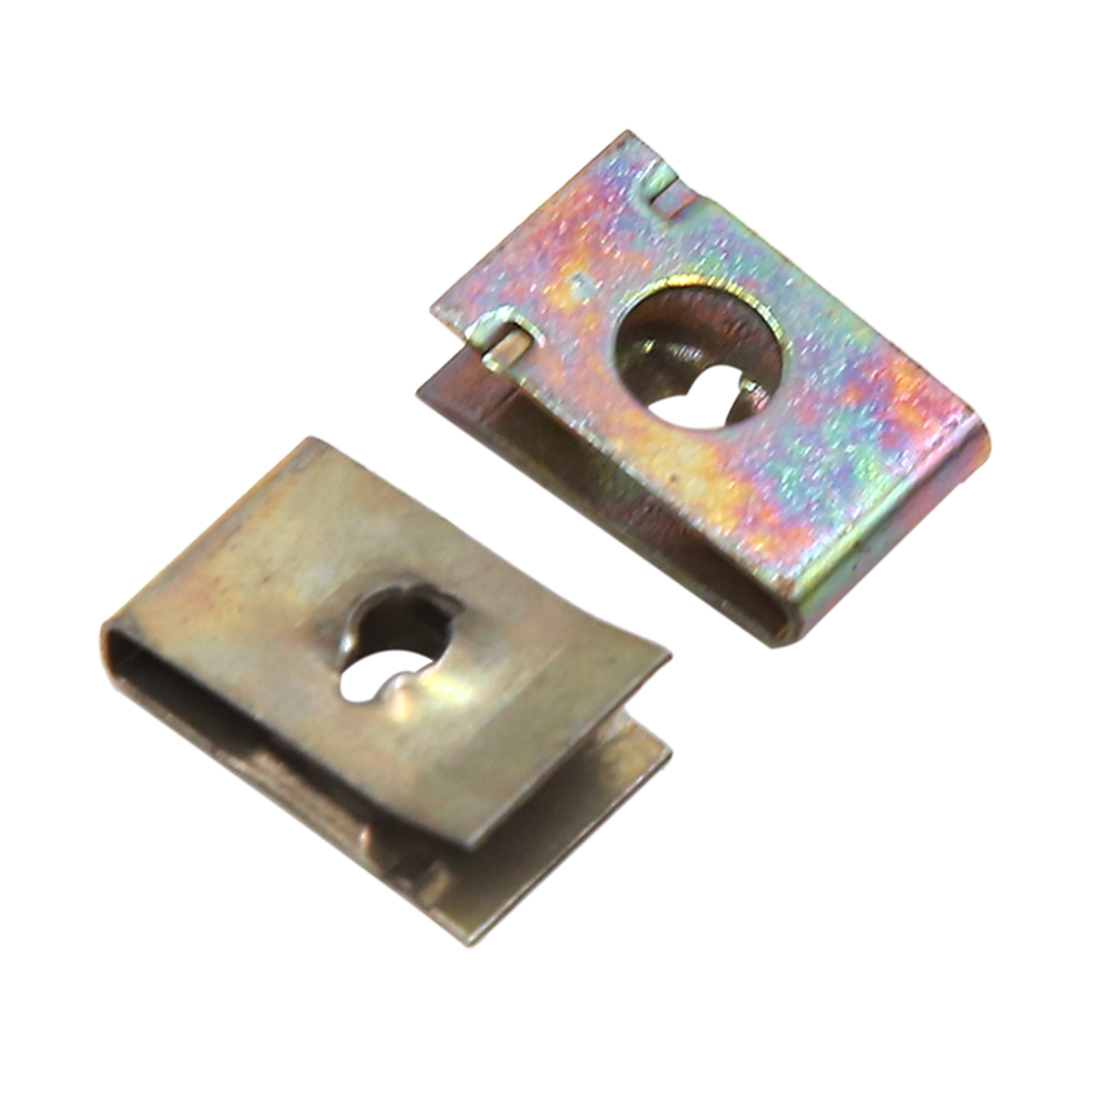 50pcs 6mm Hole Dia Metal Retainer Car Door Pannel Screw U-Type Clips Rivets